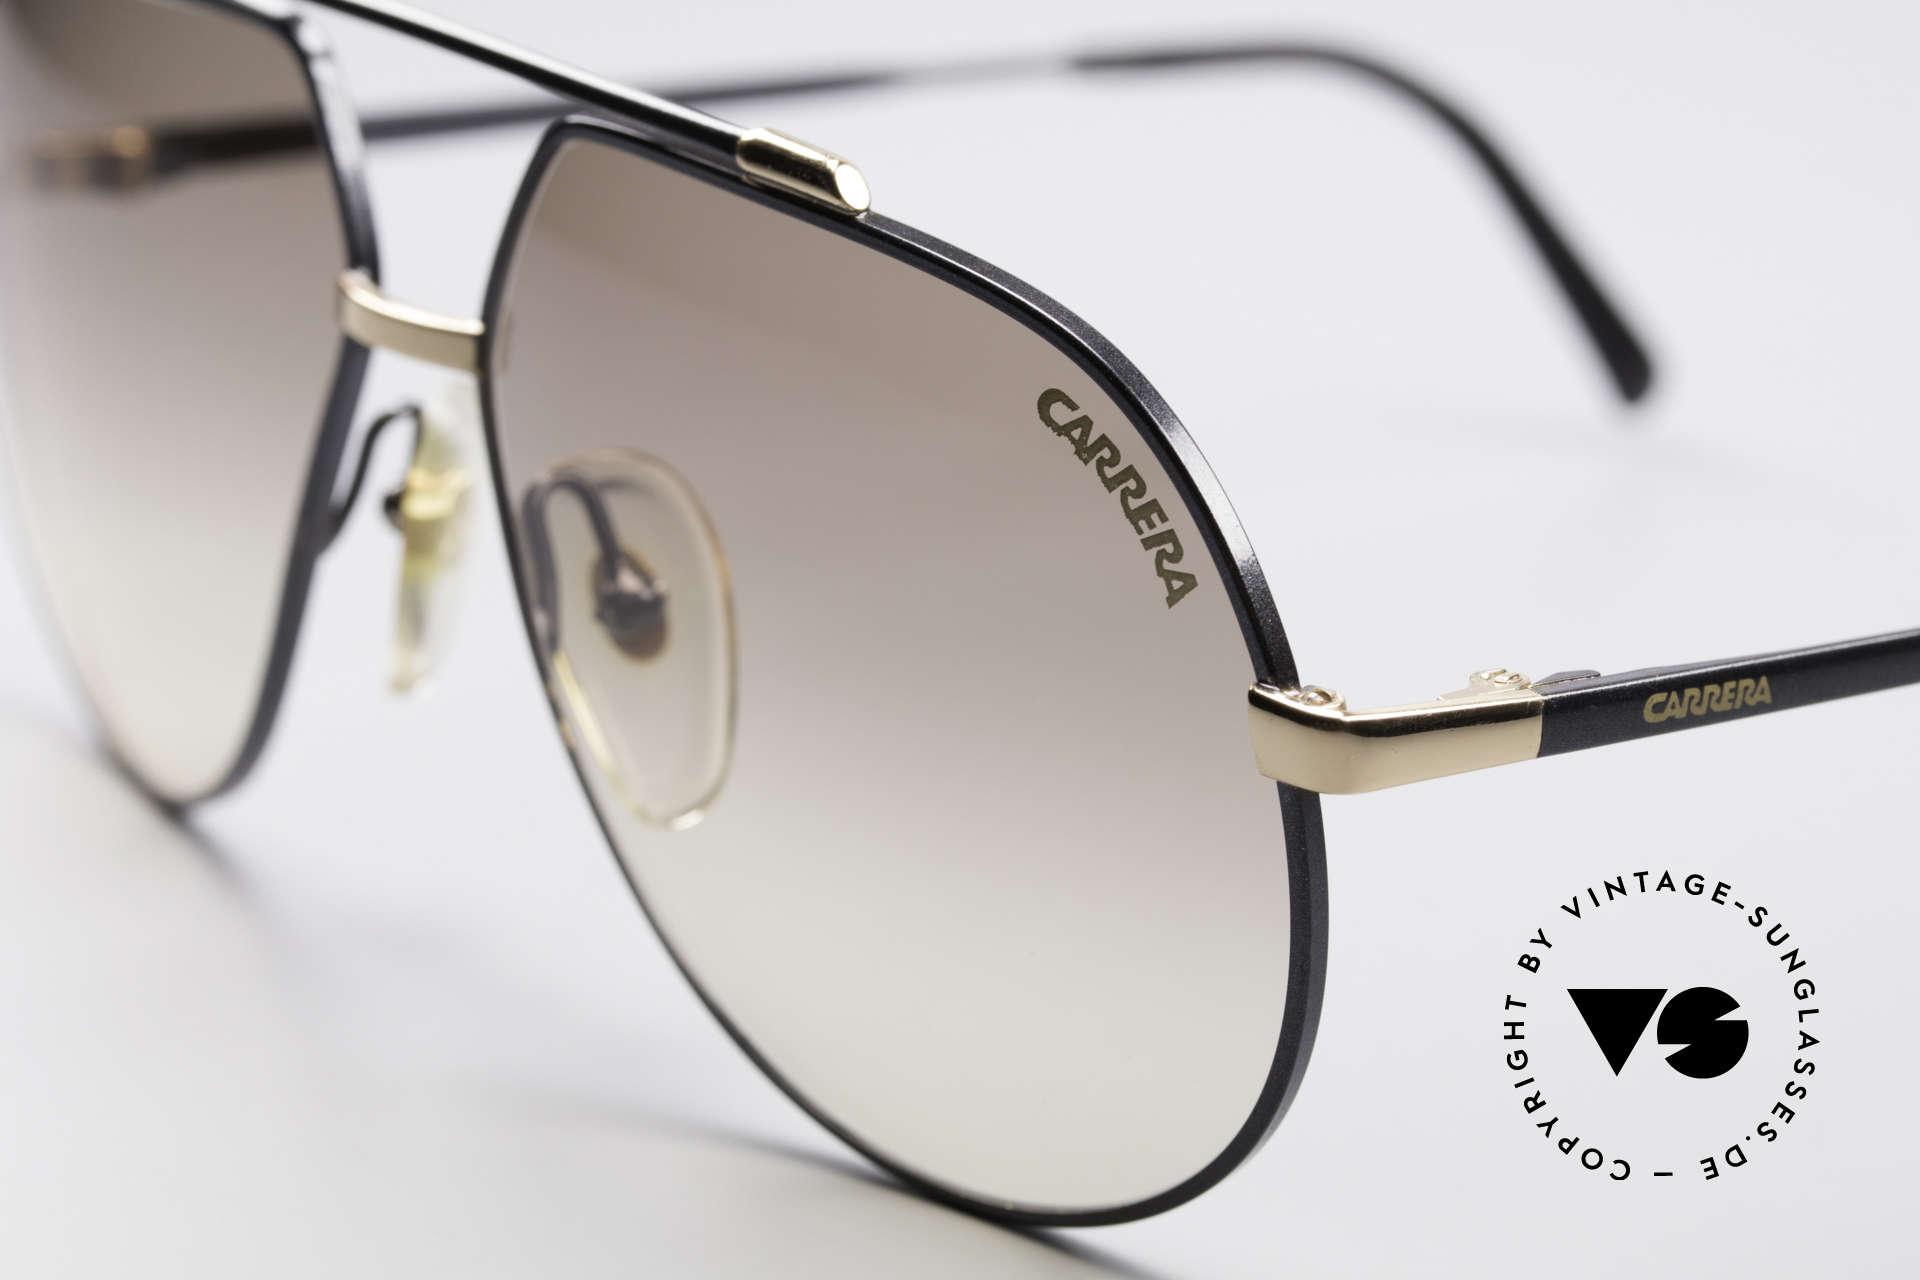 Carrera 5369 90's Men's Sunglasses, black/gold frame finish with brown-gradient lenses, Made for Men